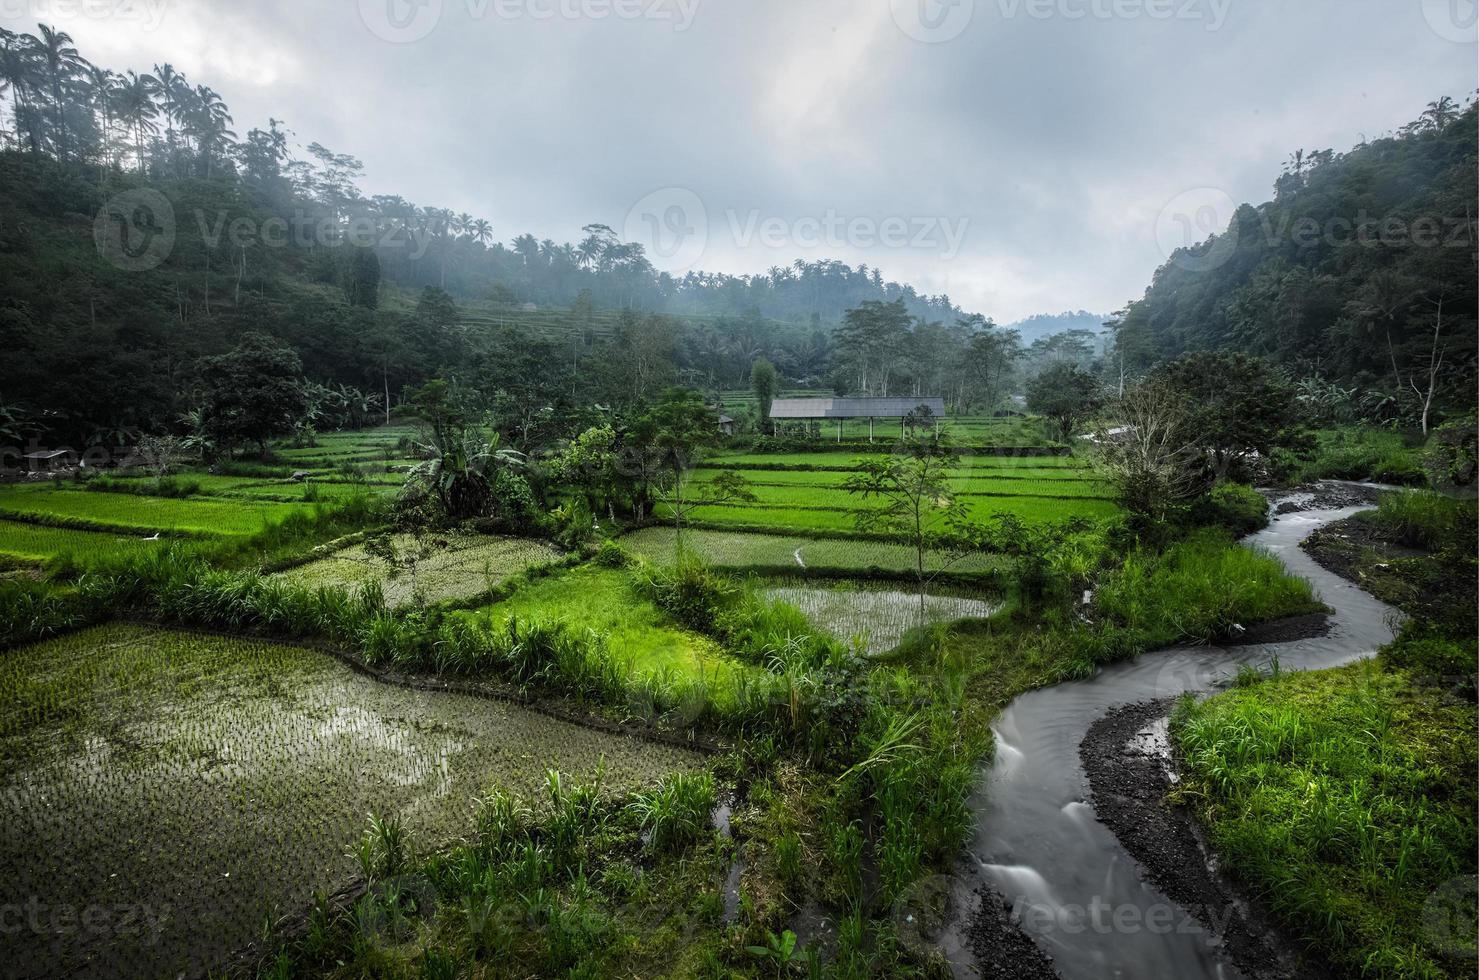 Field of rice photo